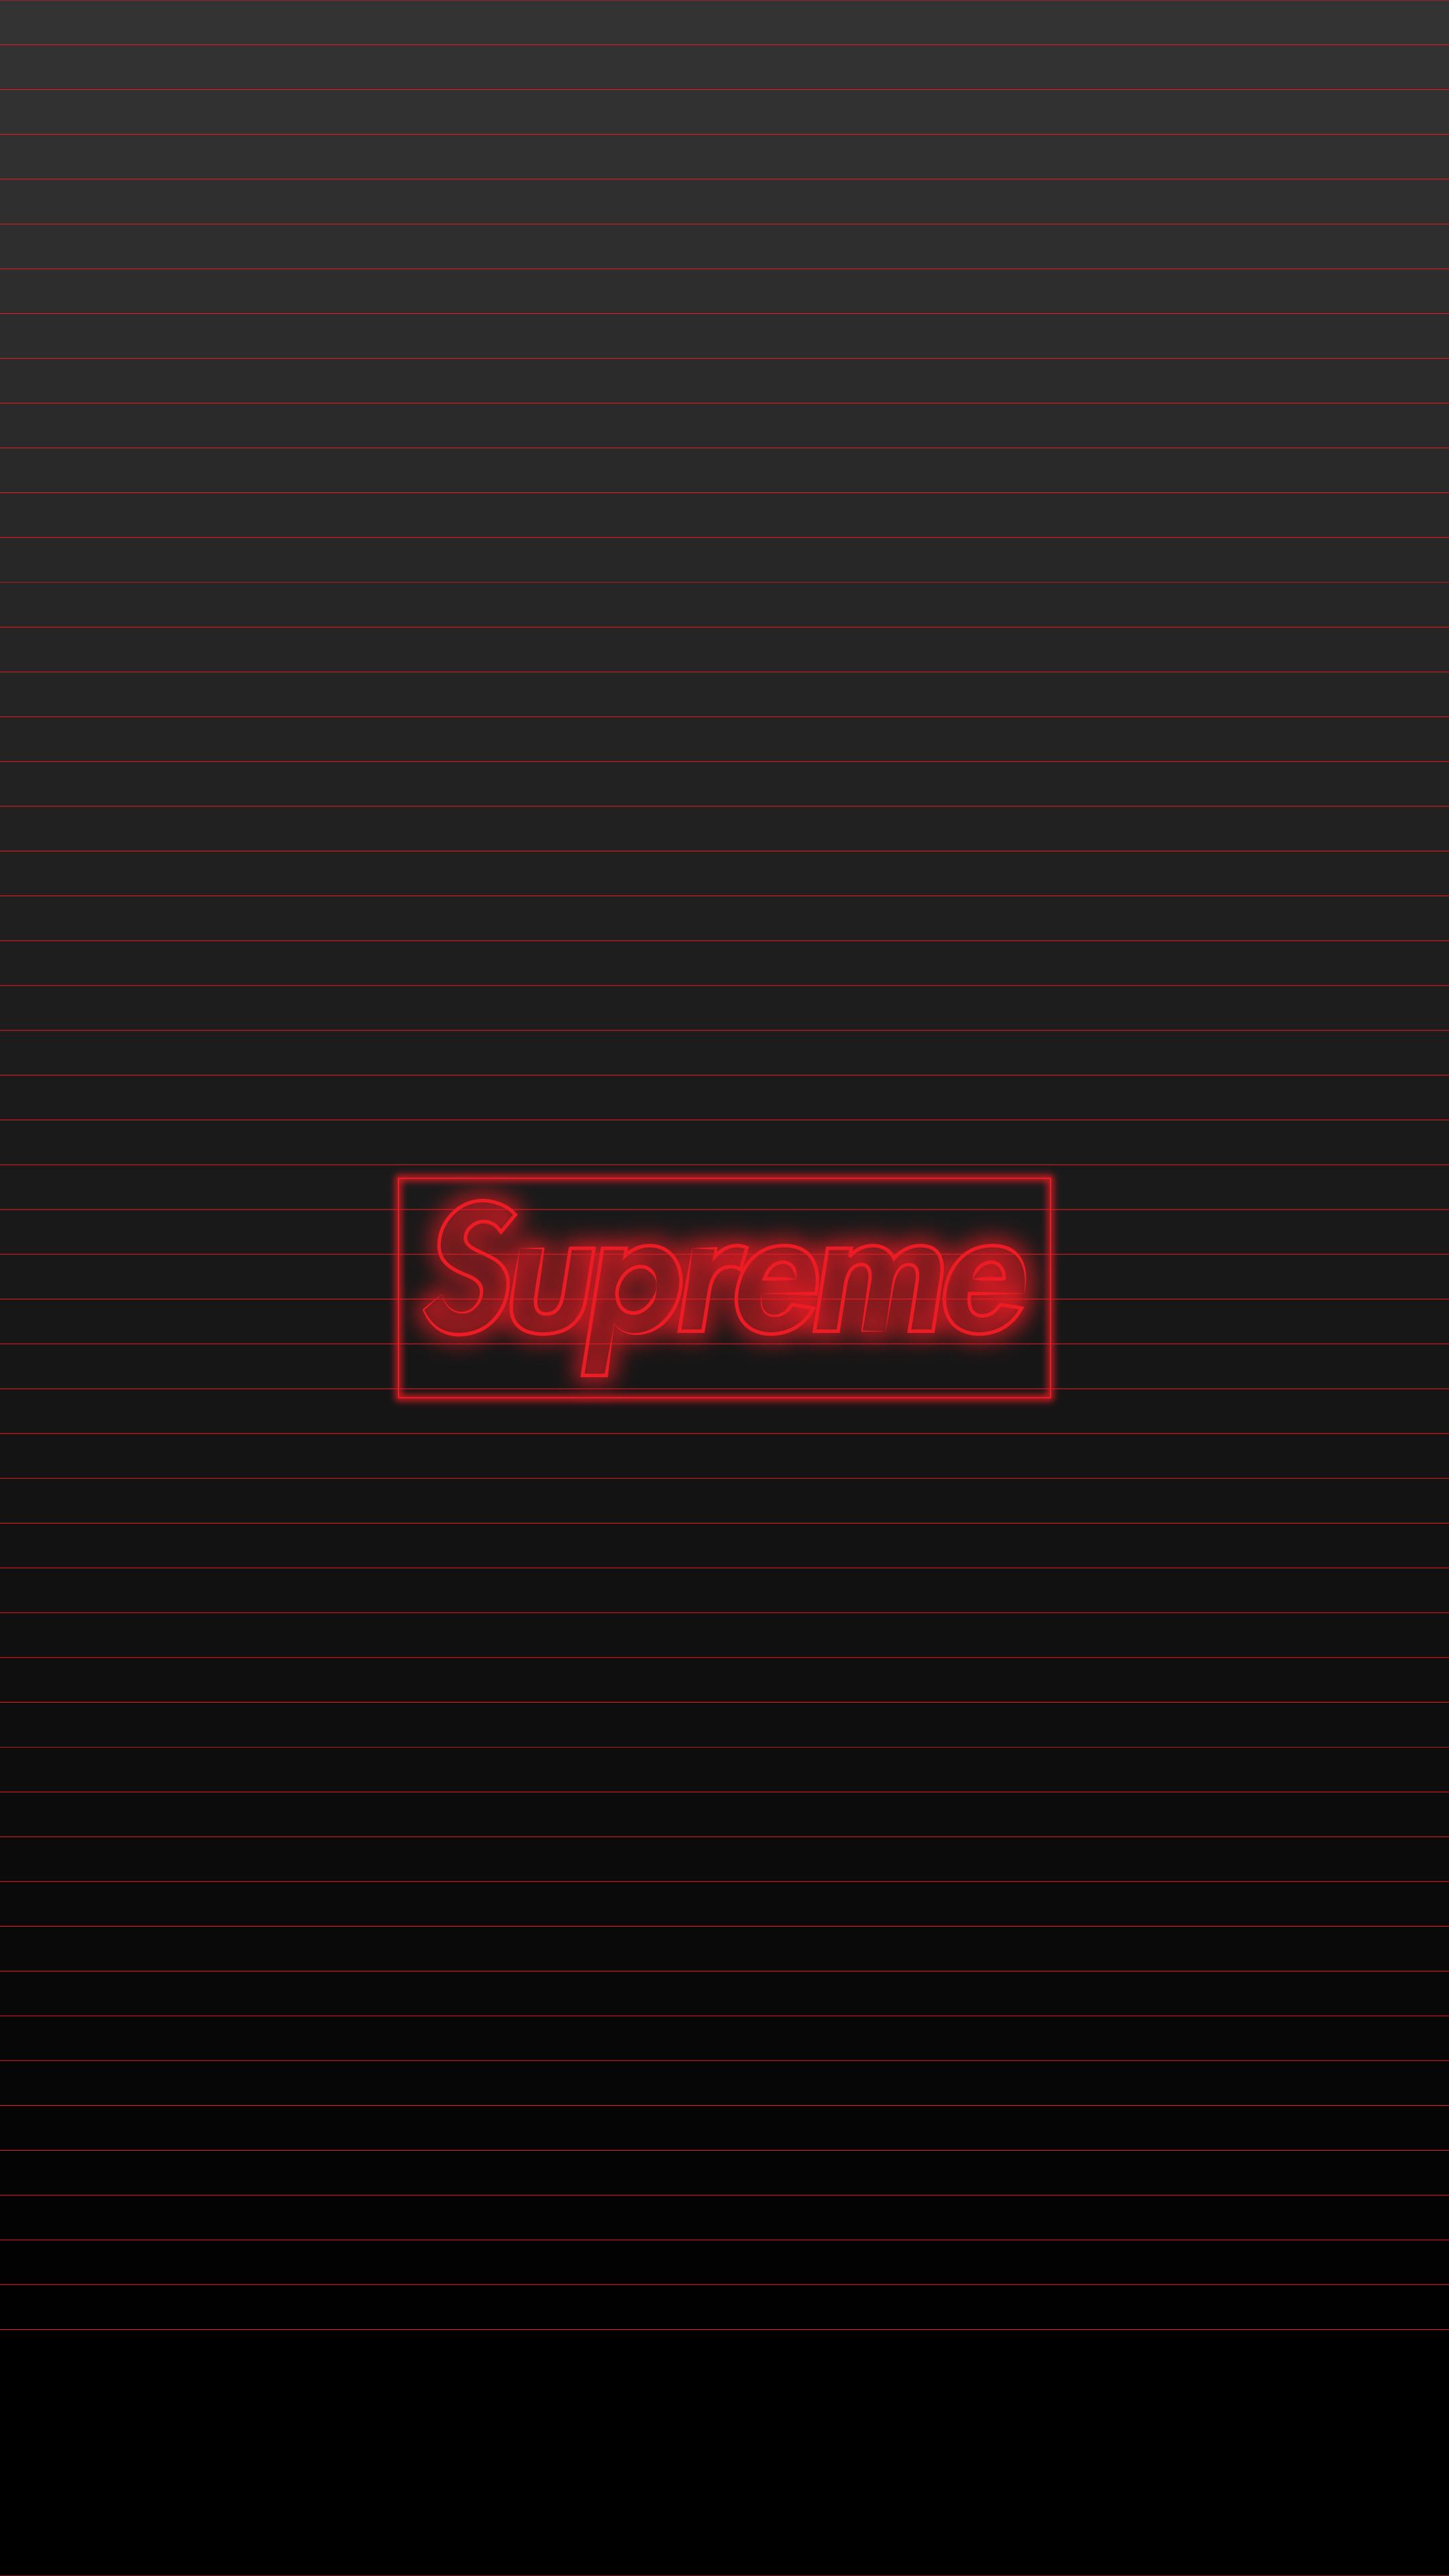 supreme logo neon